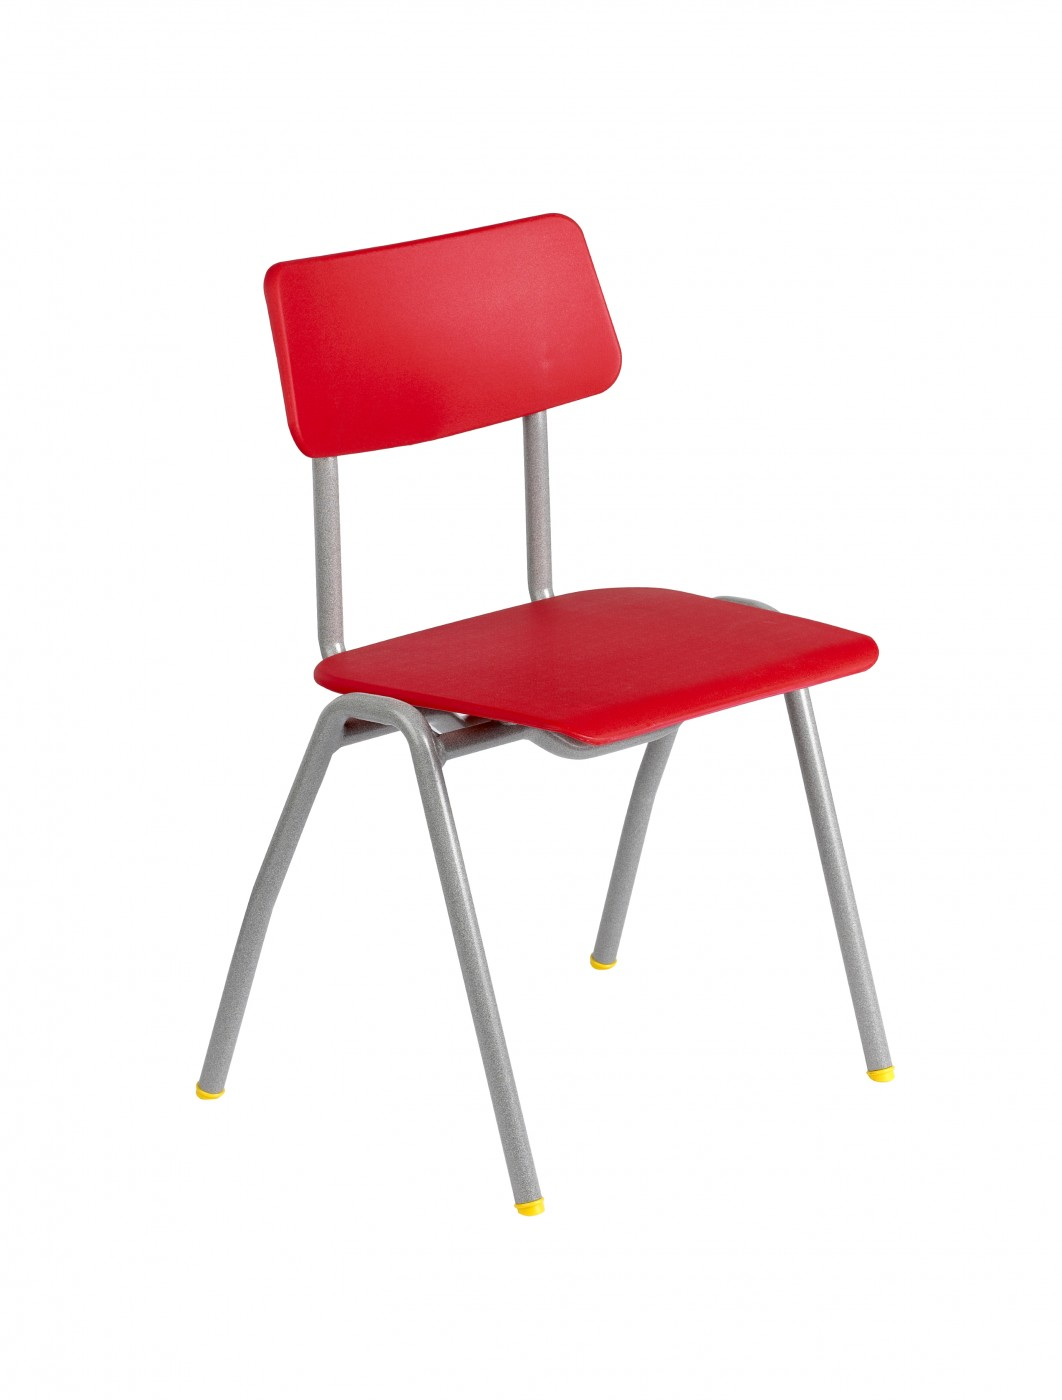 Metalliform BSE Stacking Classroom Chair | 121 Office